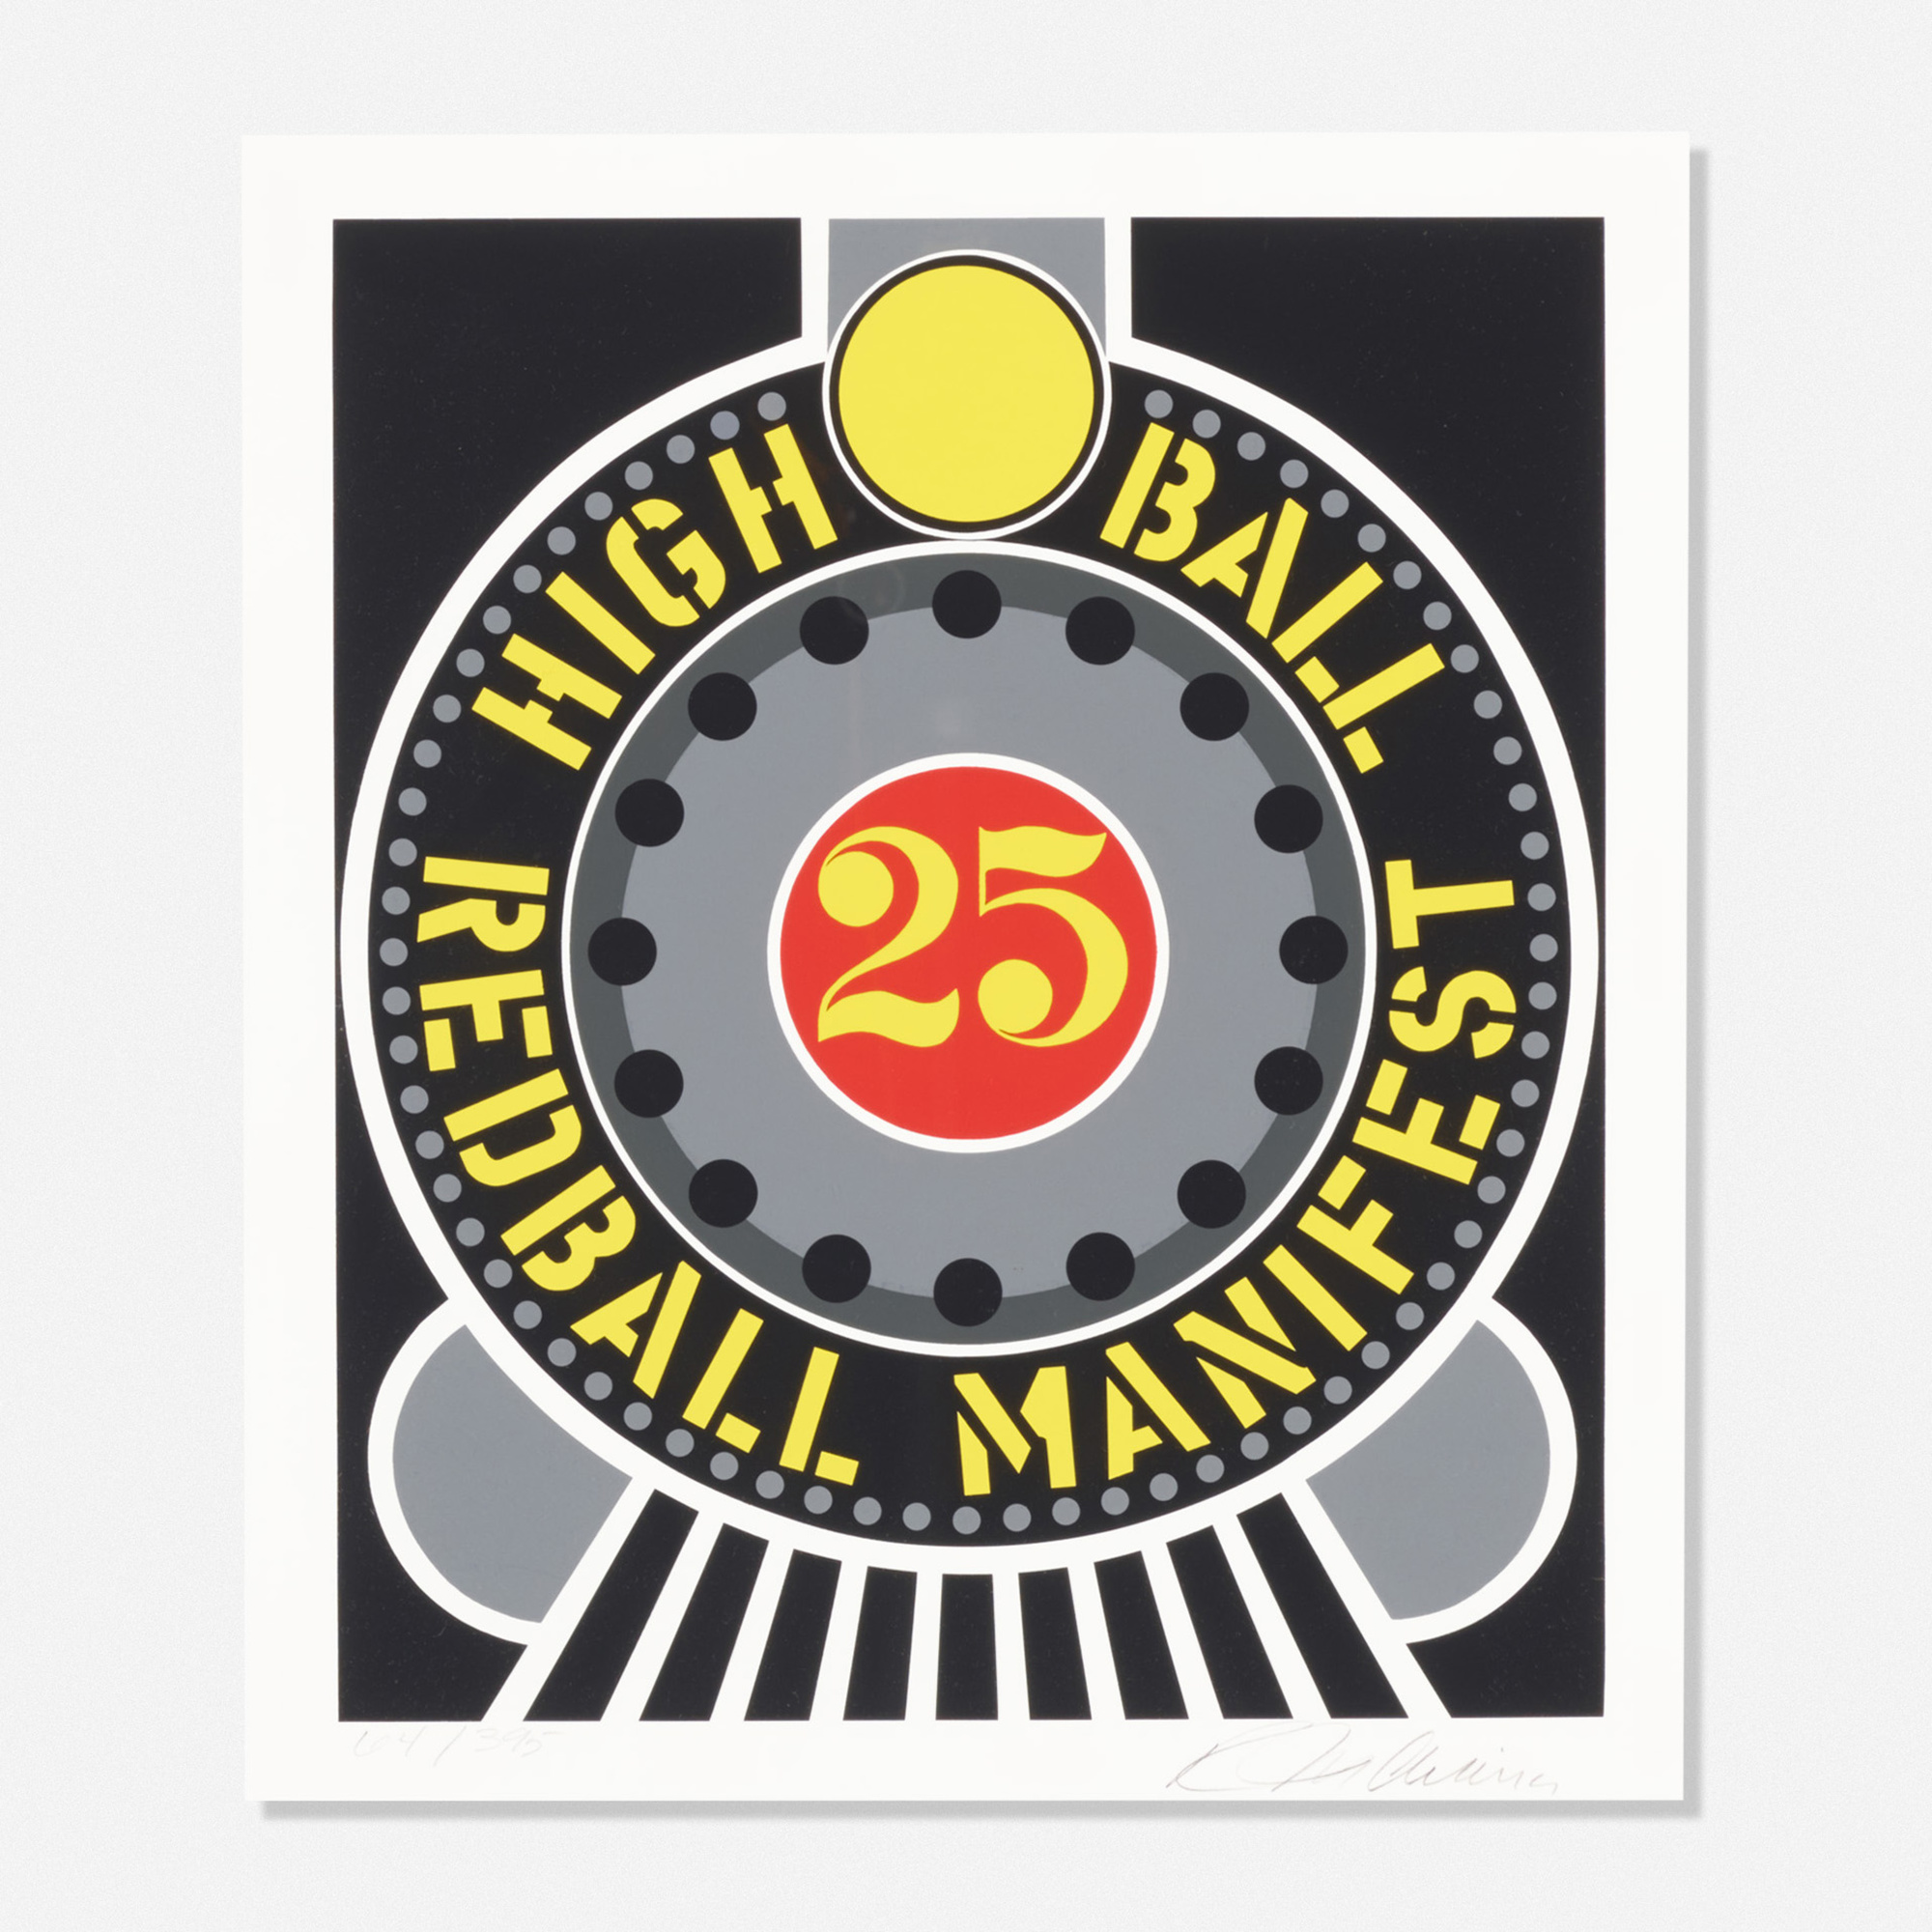 147: Robert Indiana / High Ball Redball Manifest (from the American Dream portfolio) (1 of 1)